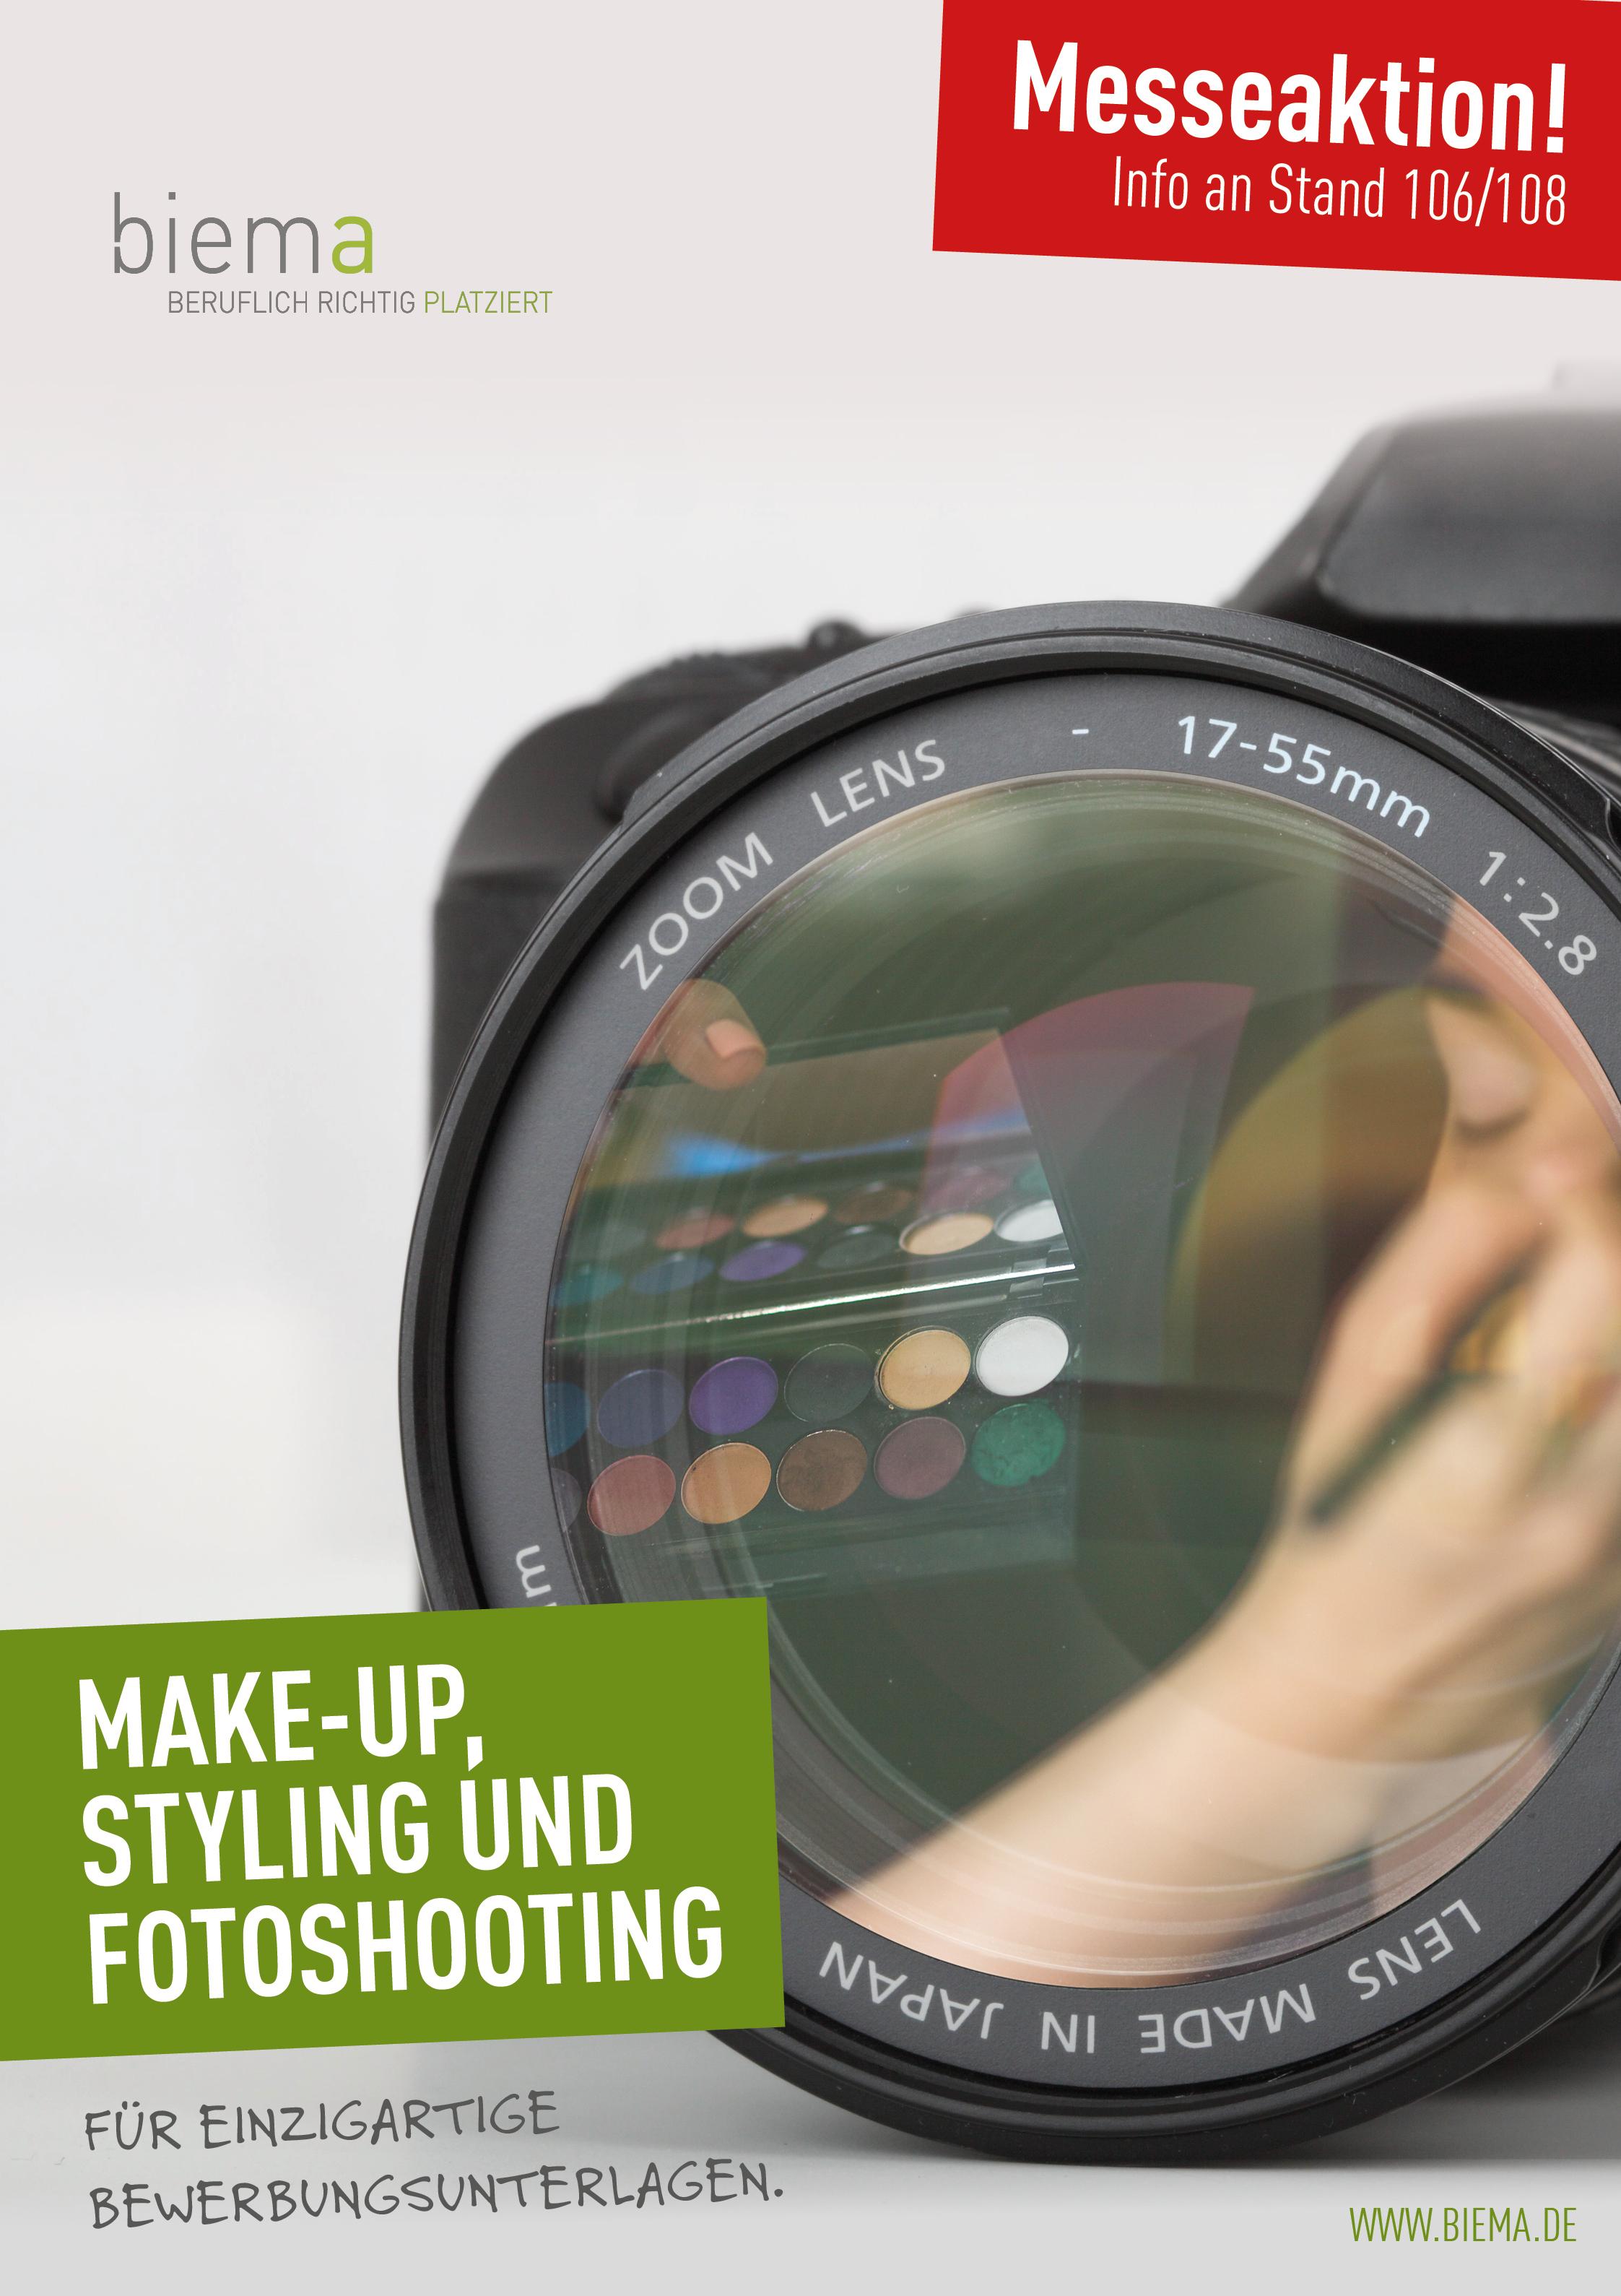 Fotoshooting, Make-Up und Styling